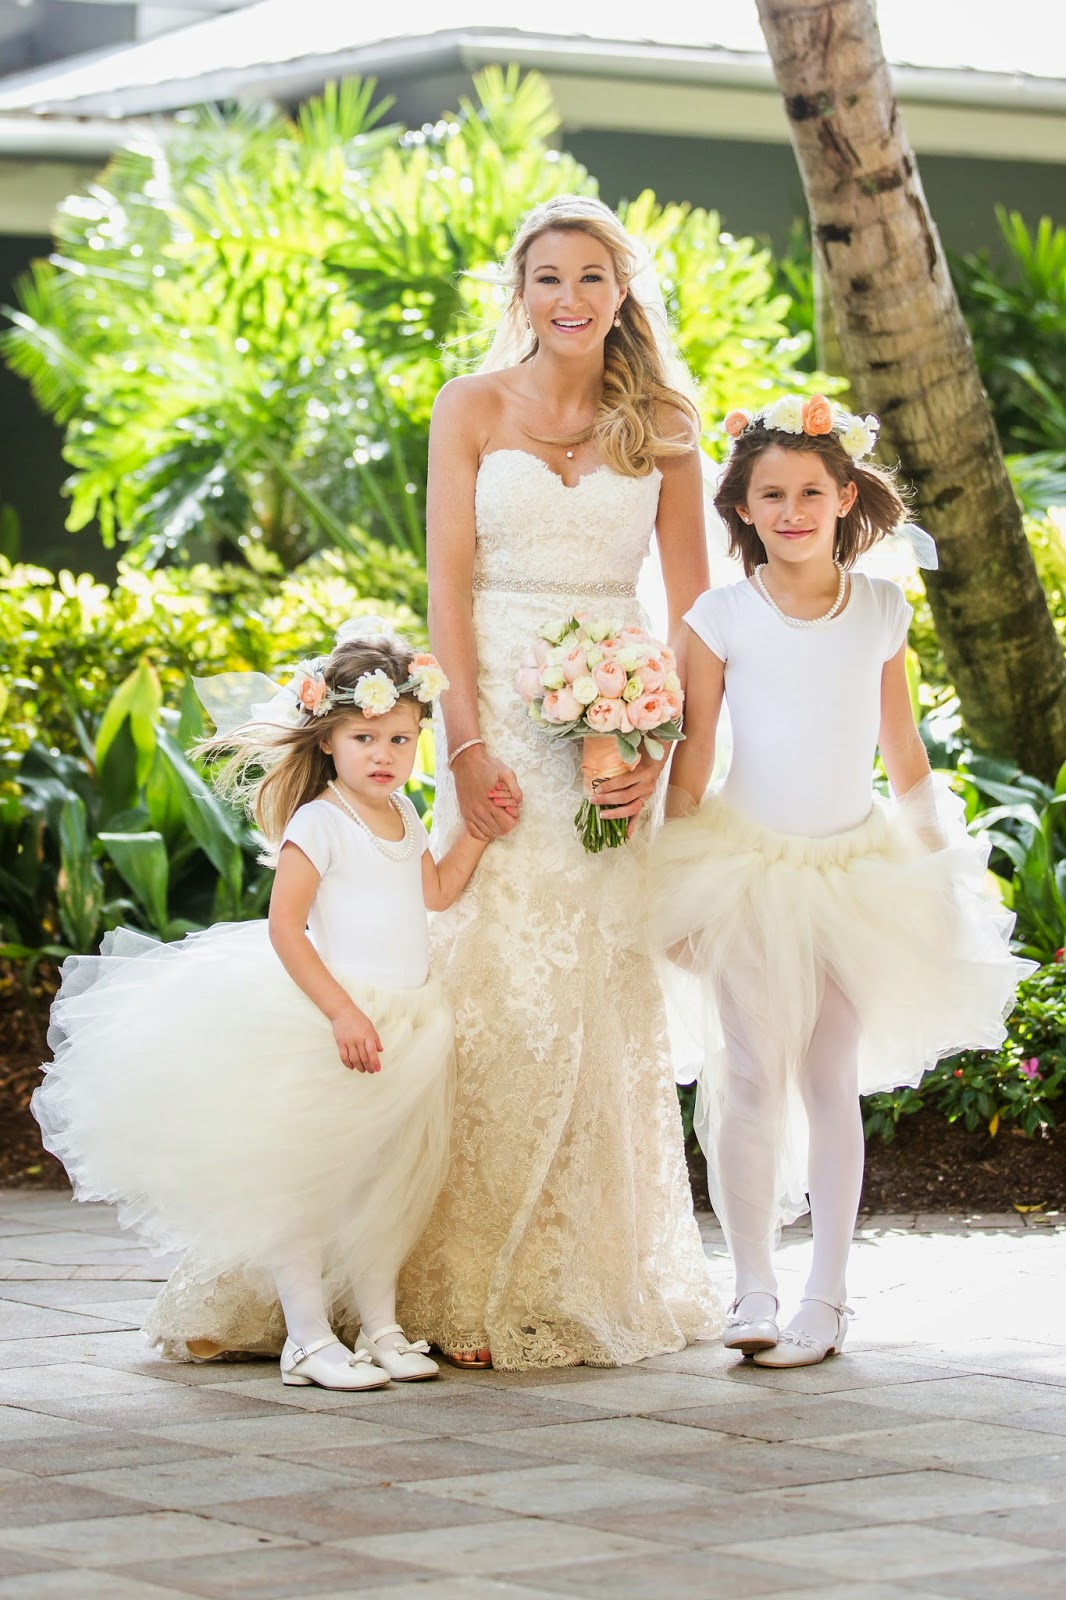 my sister s wedding Amazoncom: my sister's wedding: jazsmin lewis, essence atkins, flex alexander, k d aubert, paul d hannah: movies & tv.